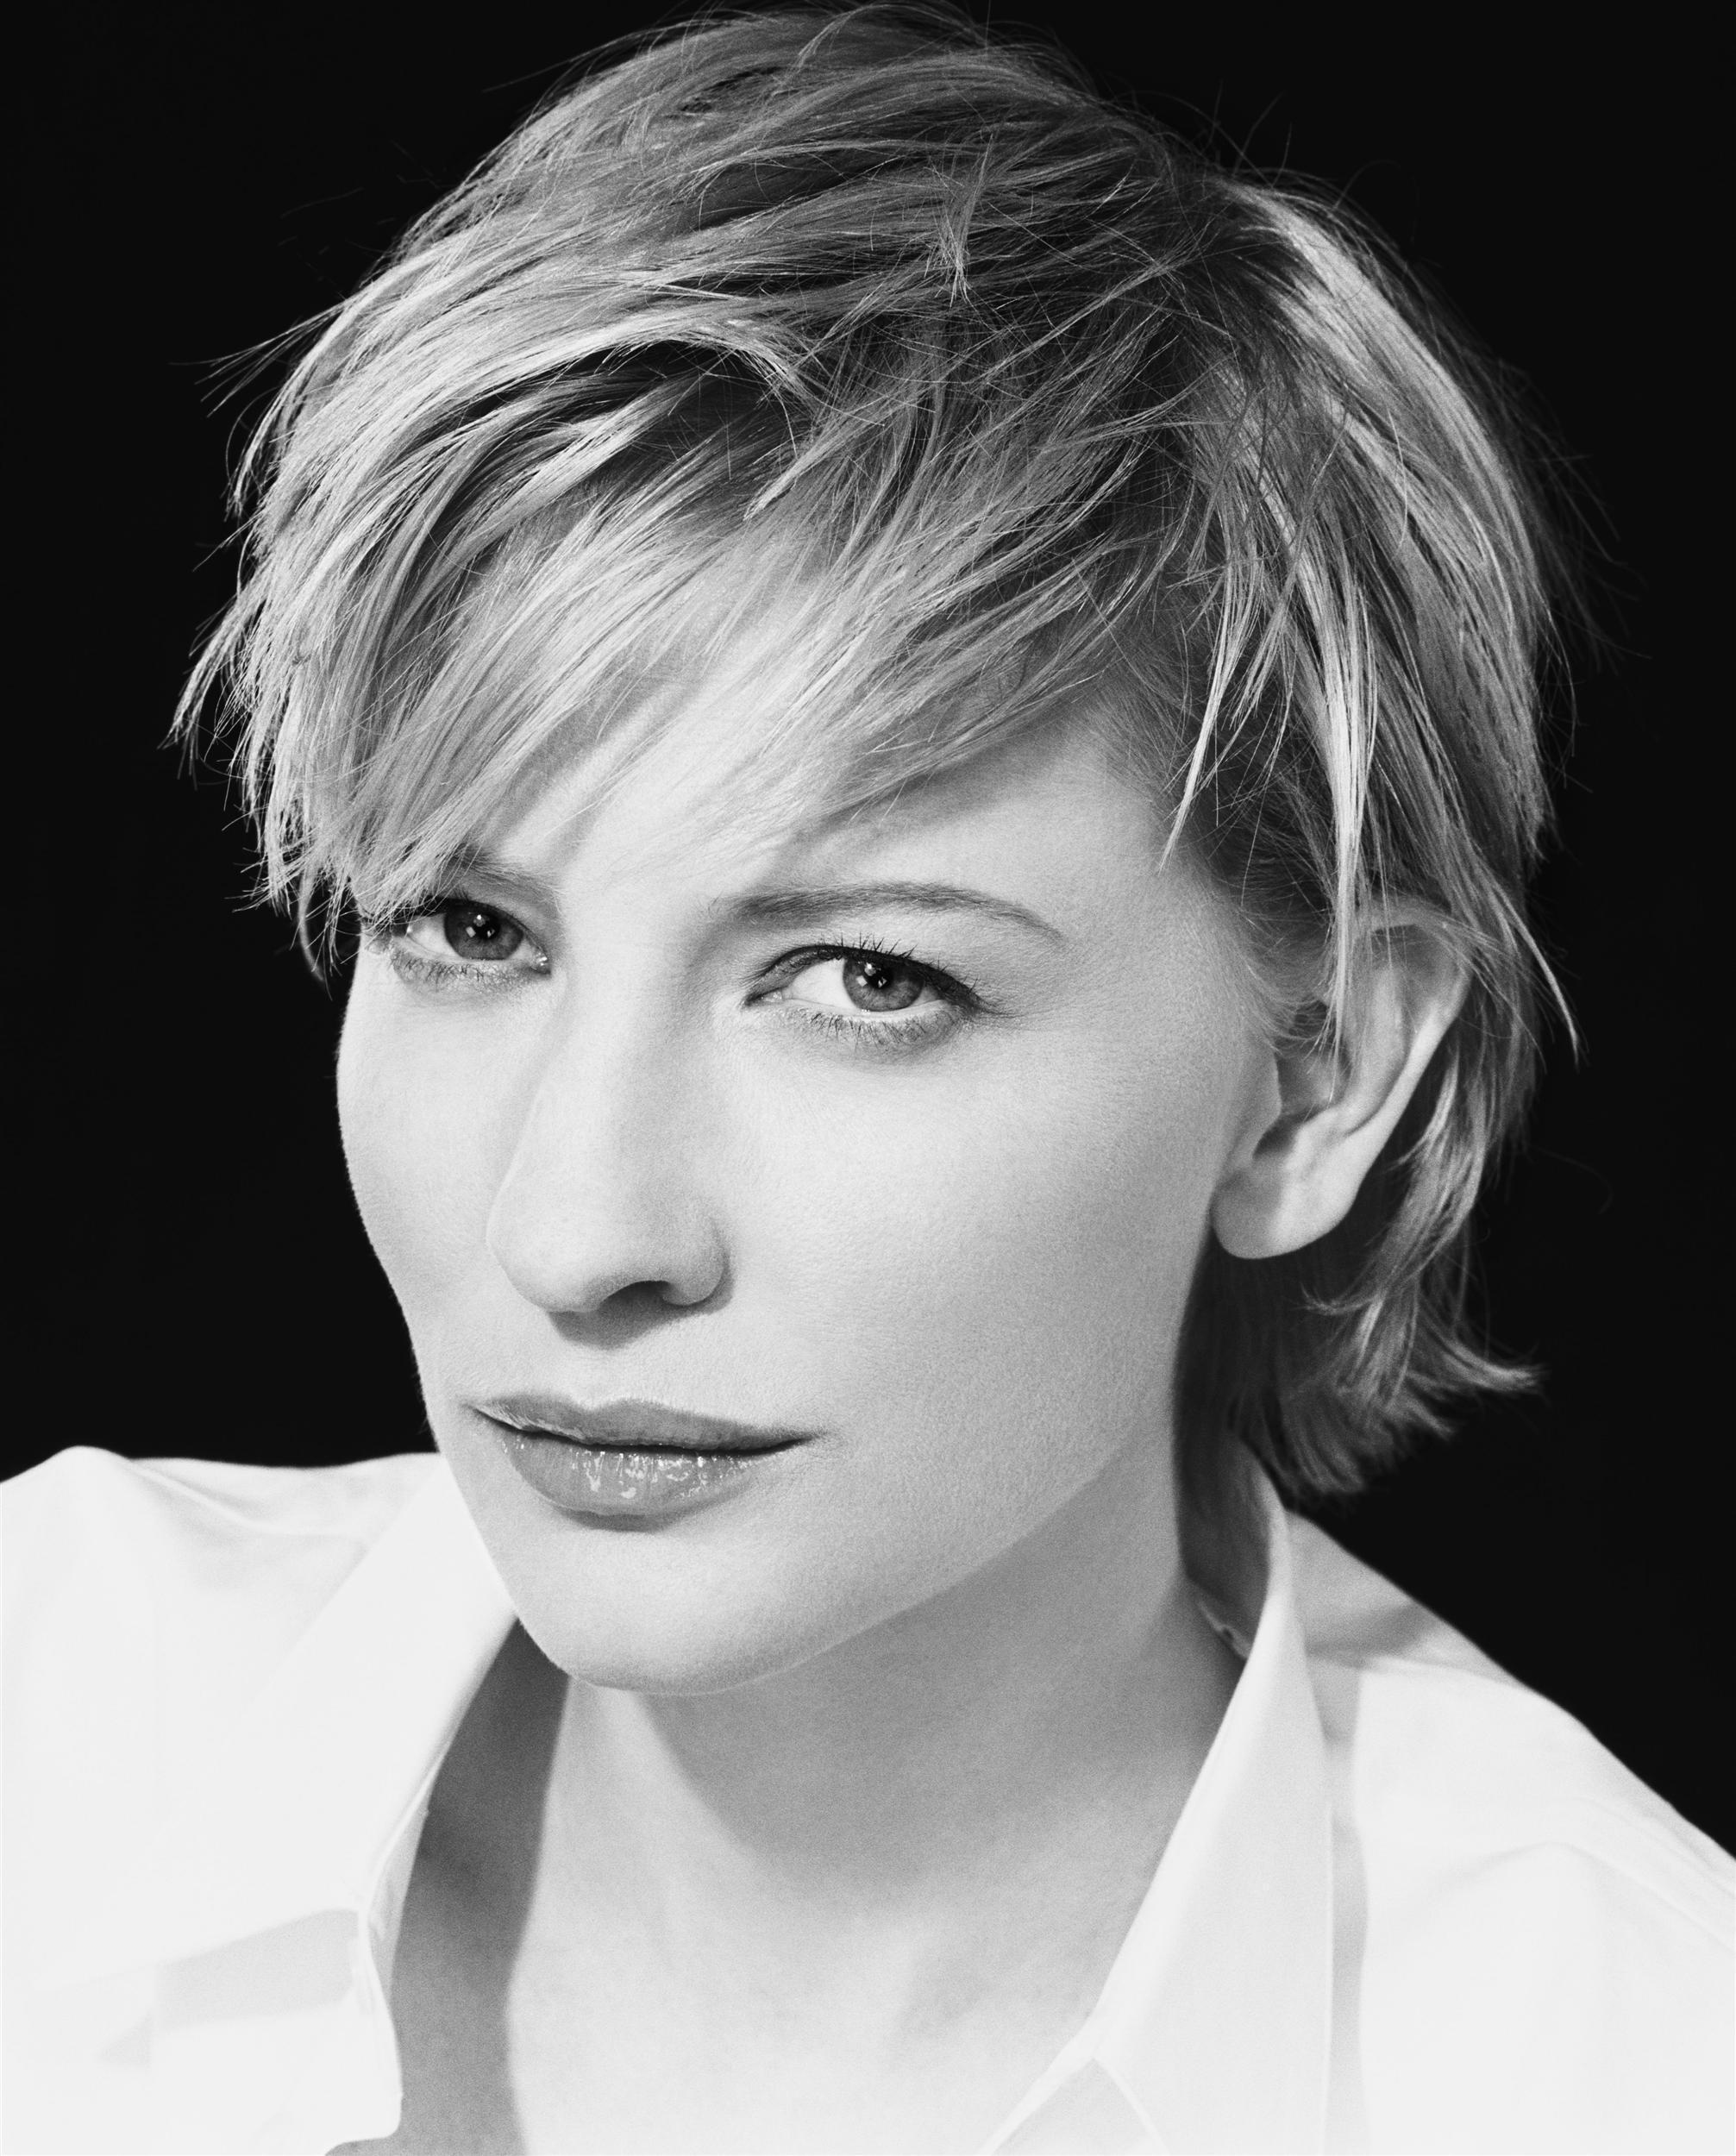 Cate Blanchett sin censuras